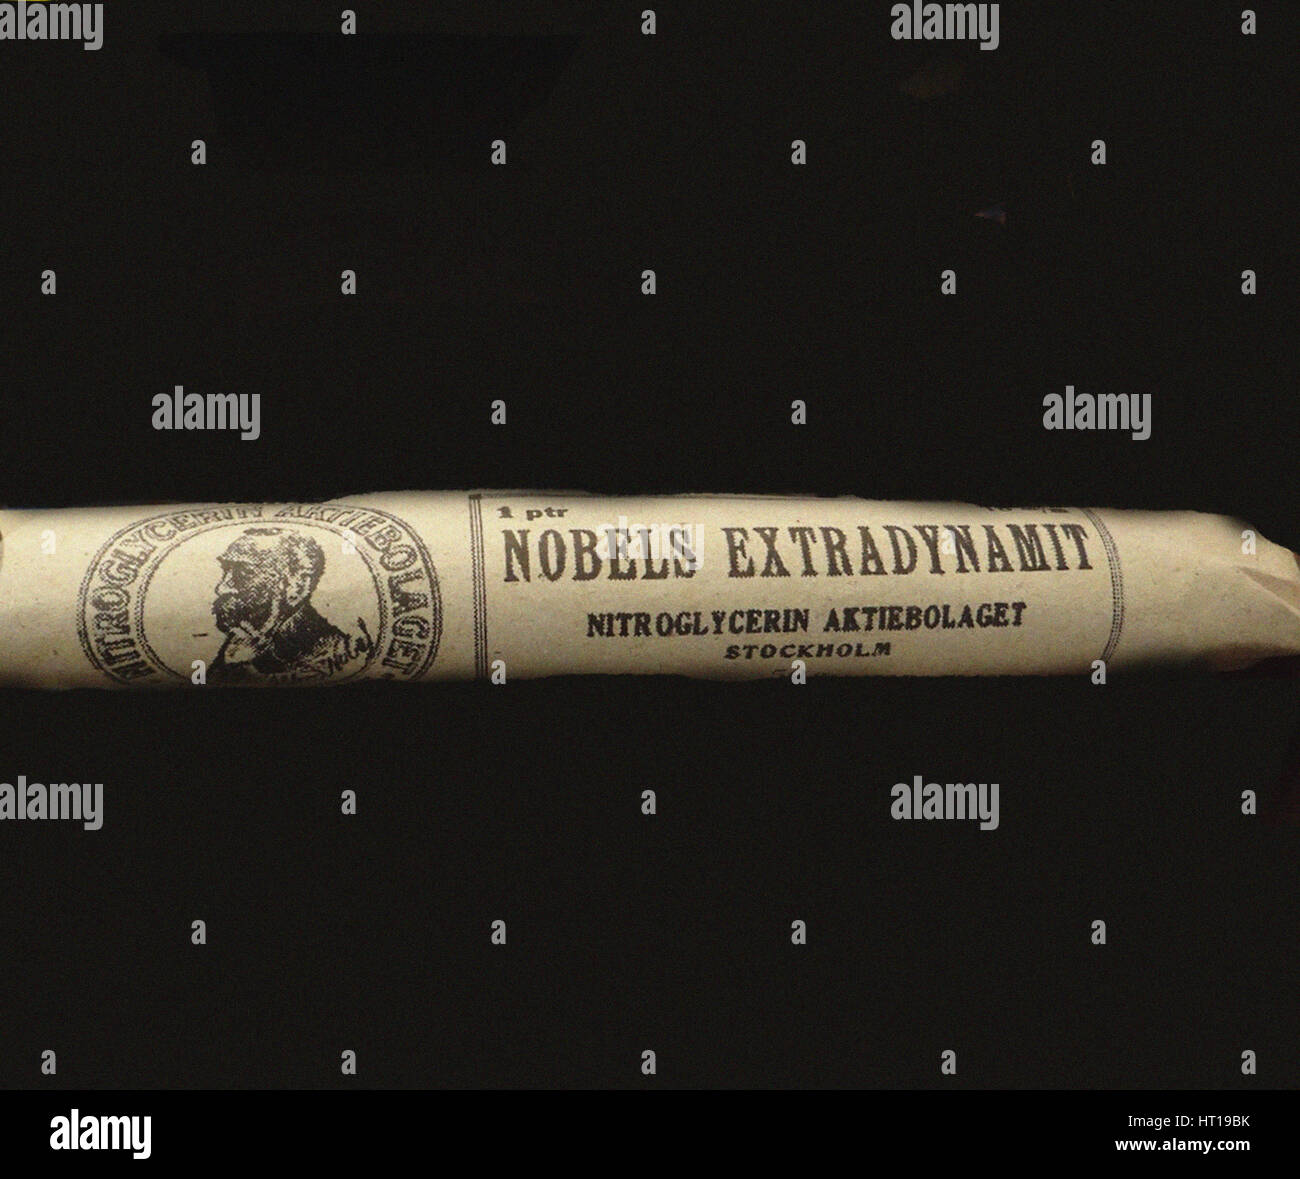 The Nobel's Extradynamit. Artist: Historic Object - Stock Image